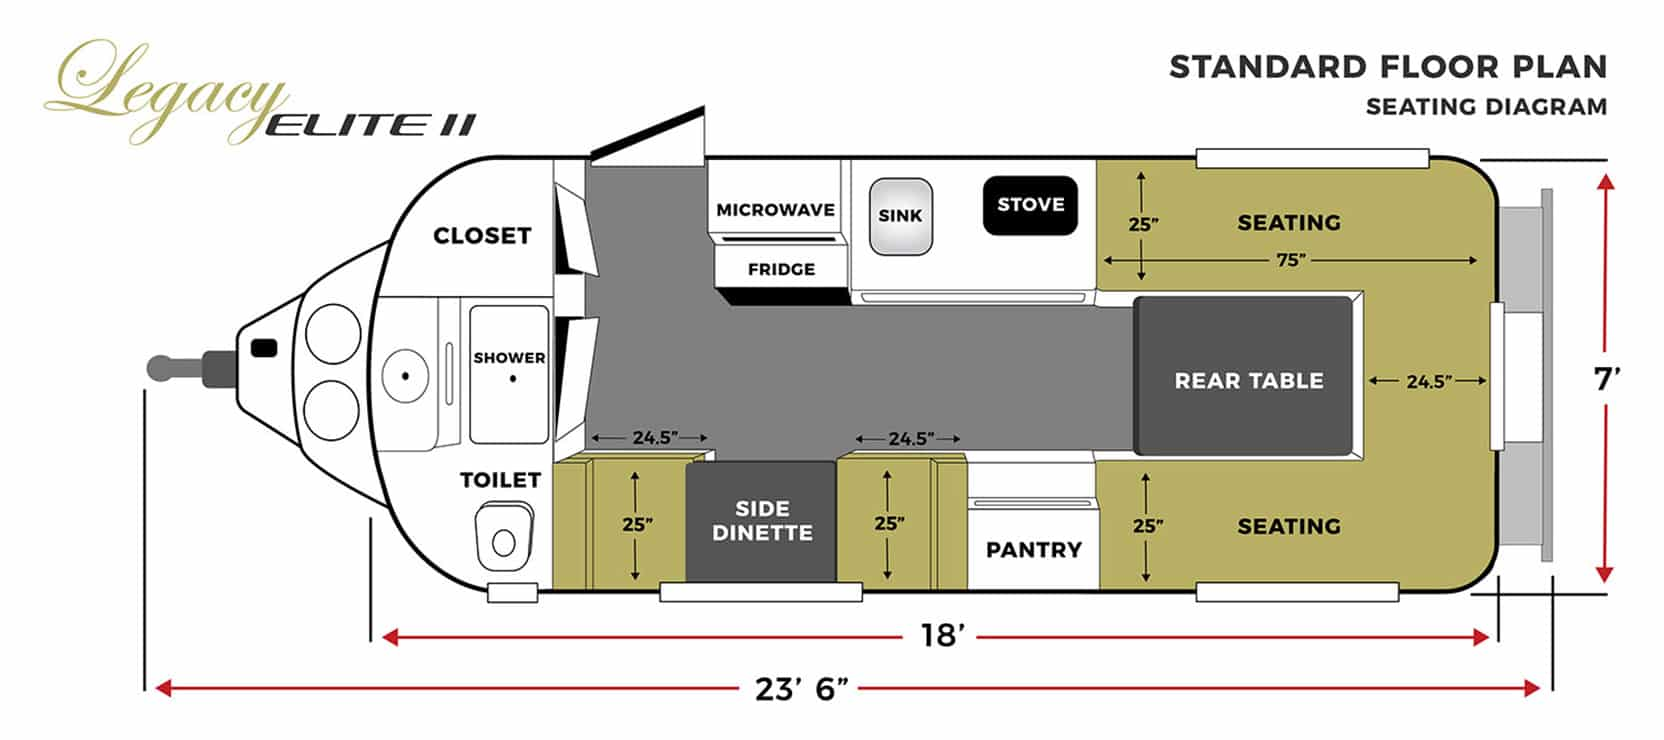 oliver travel trailers legacy elite 2 standard seating floor plan horizontal